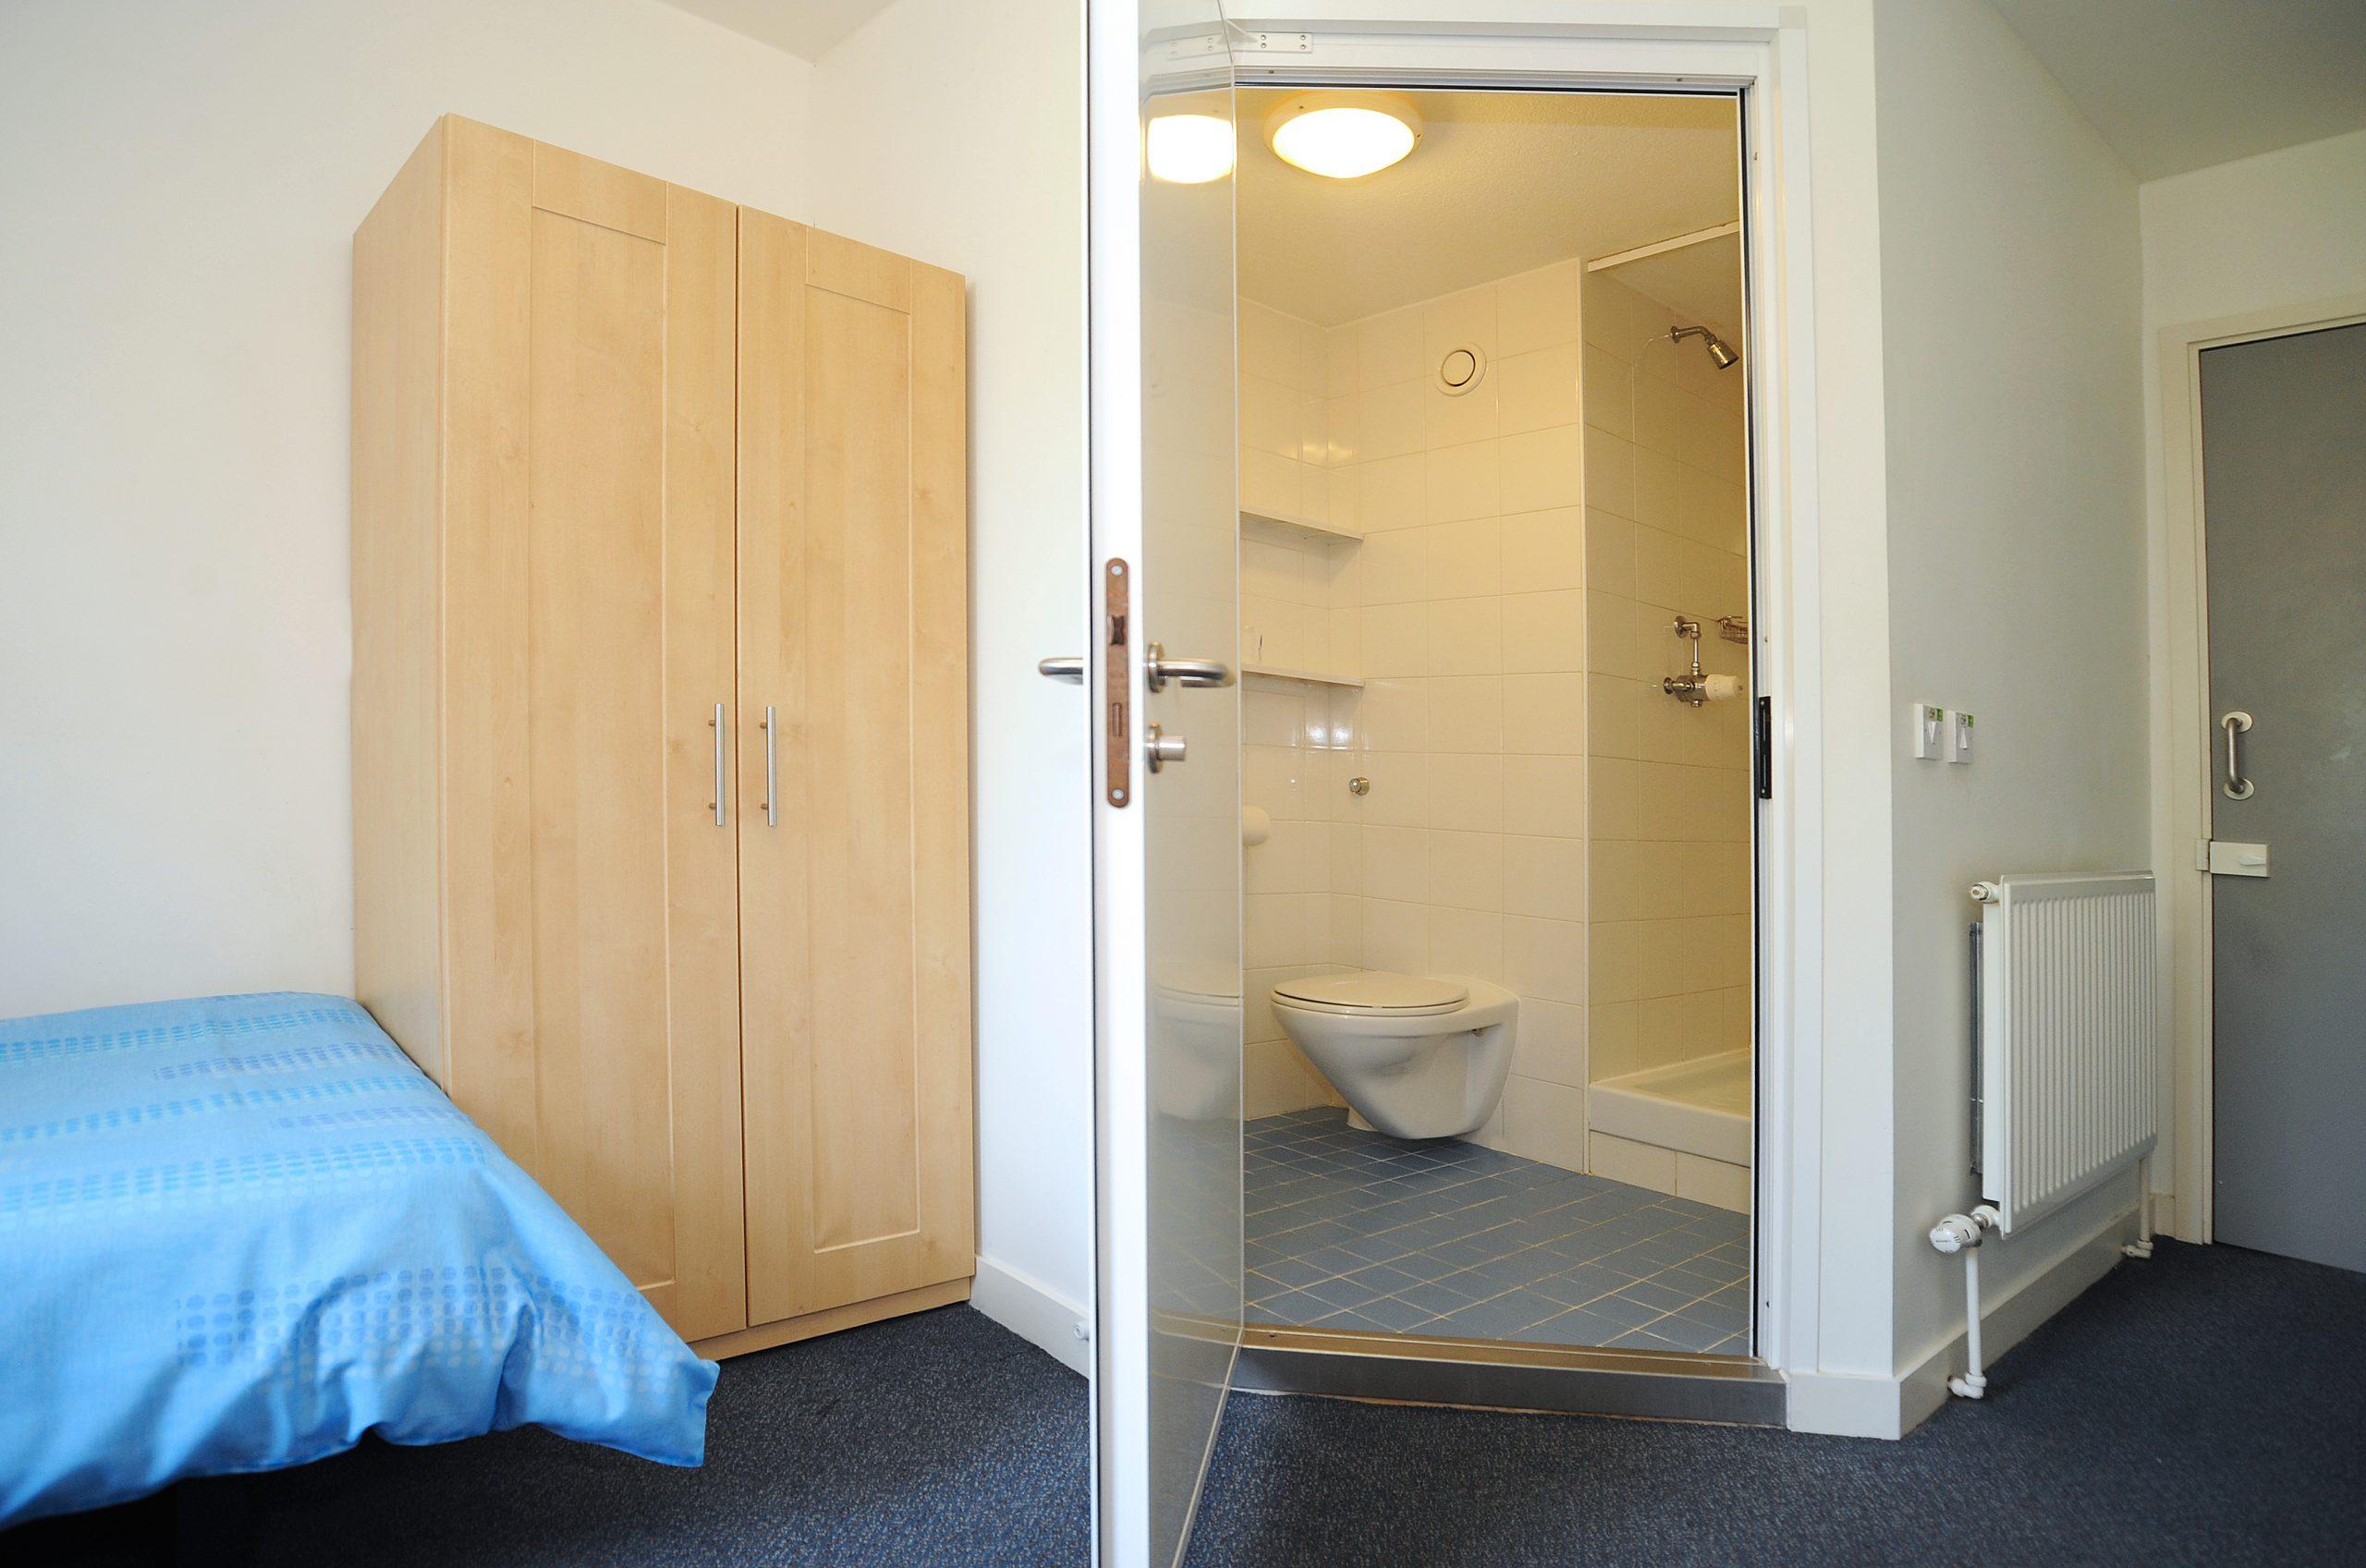 BNL - Accommodation (3)